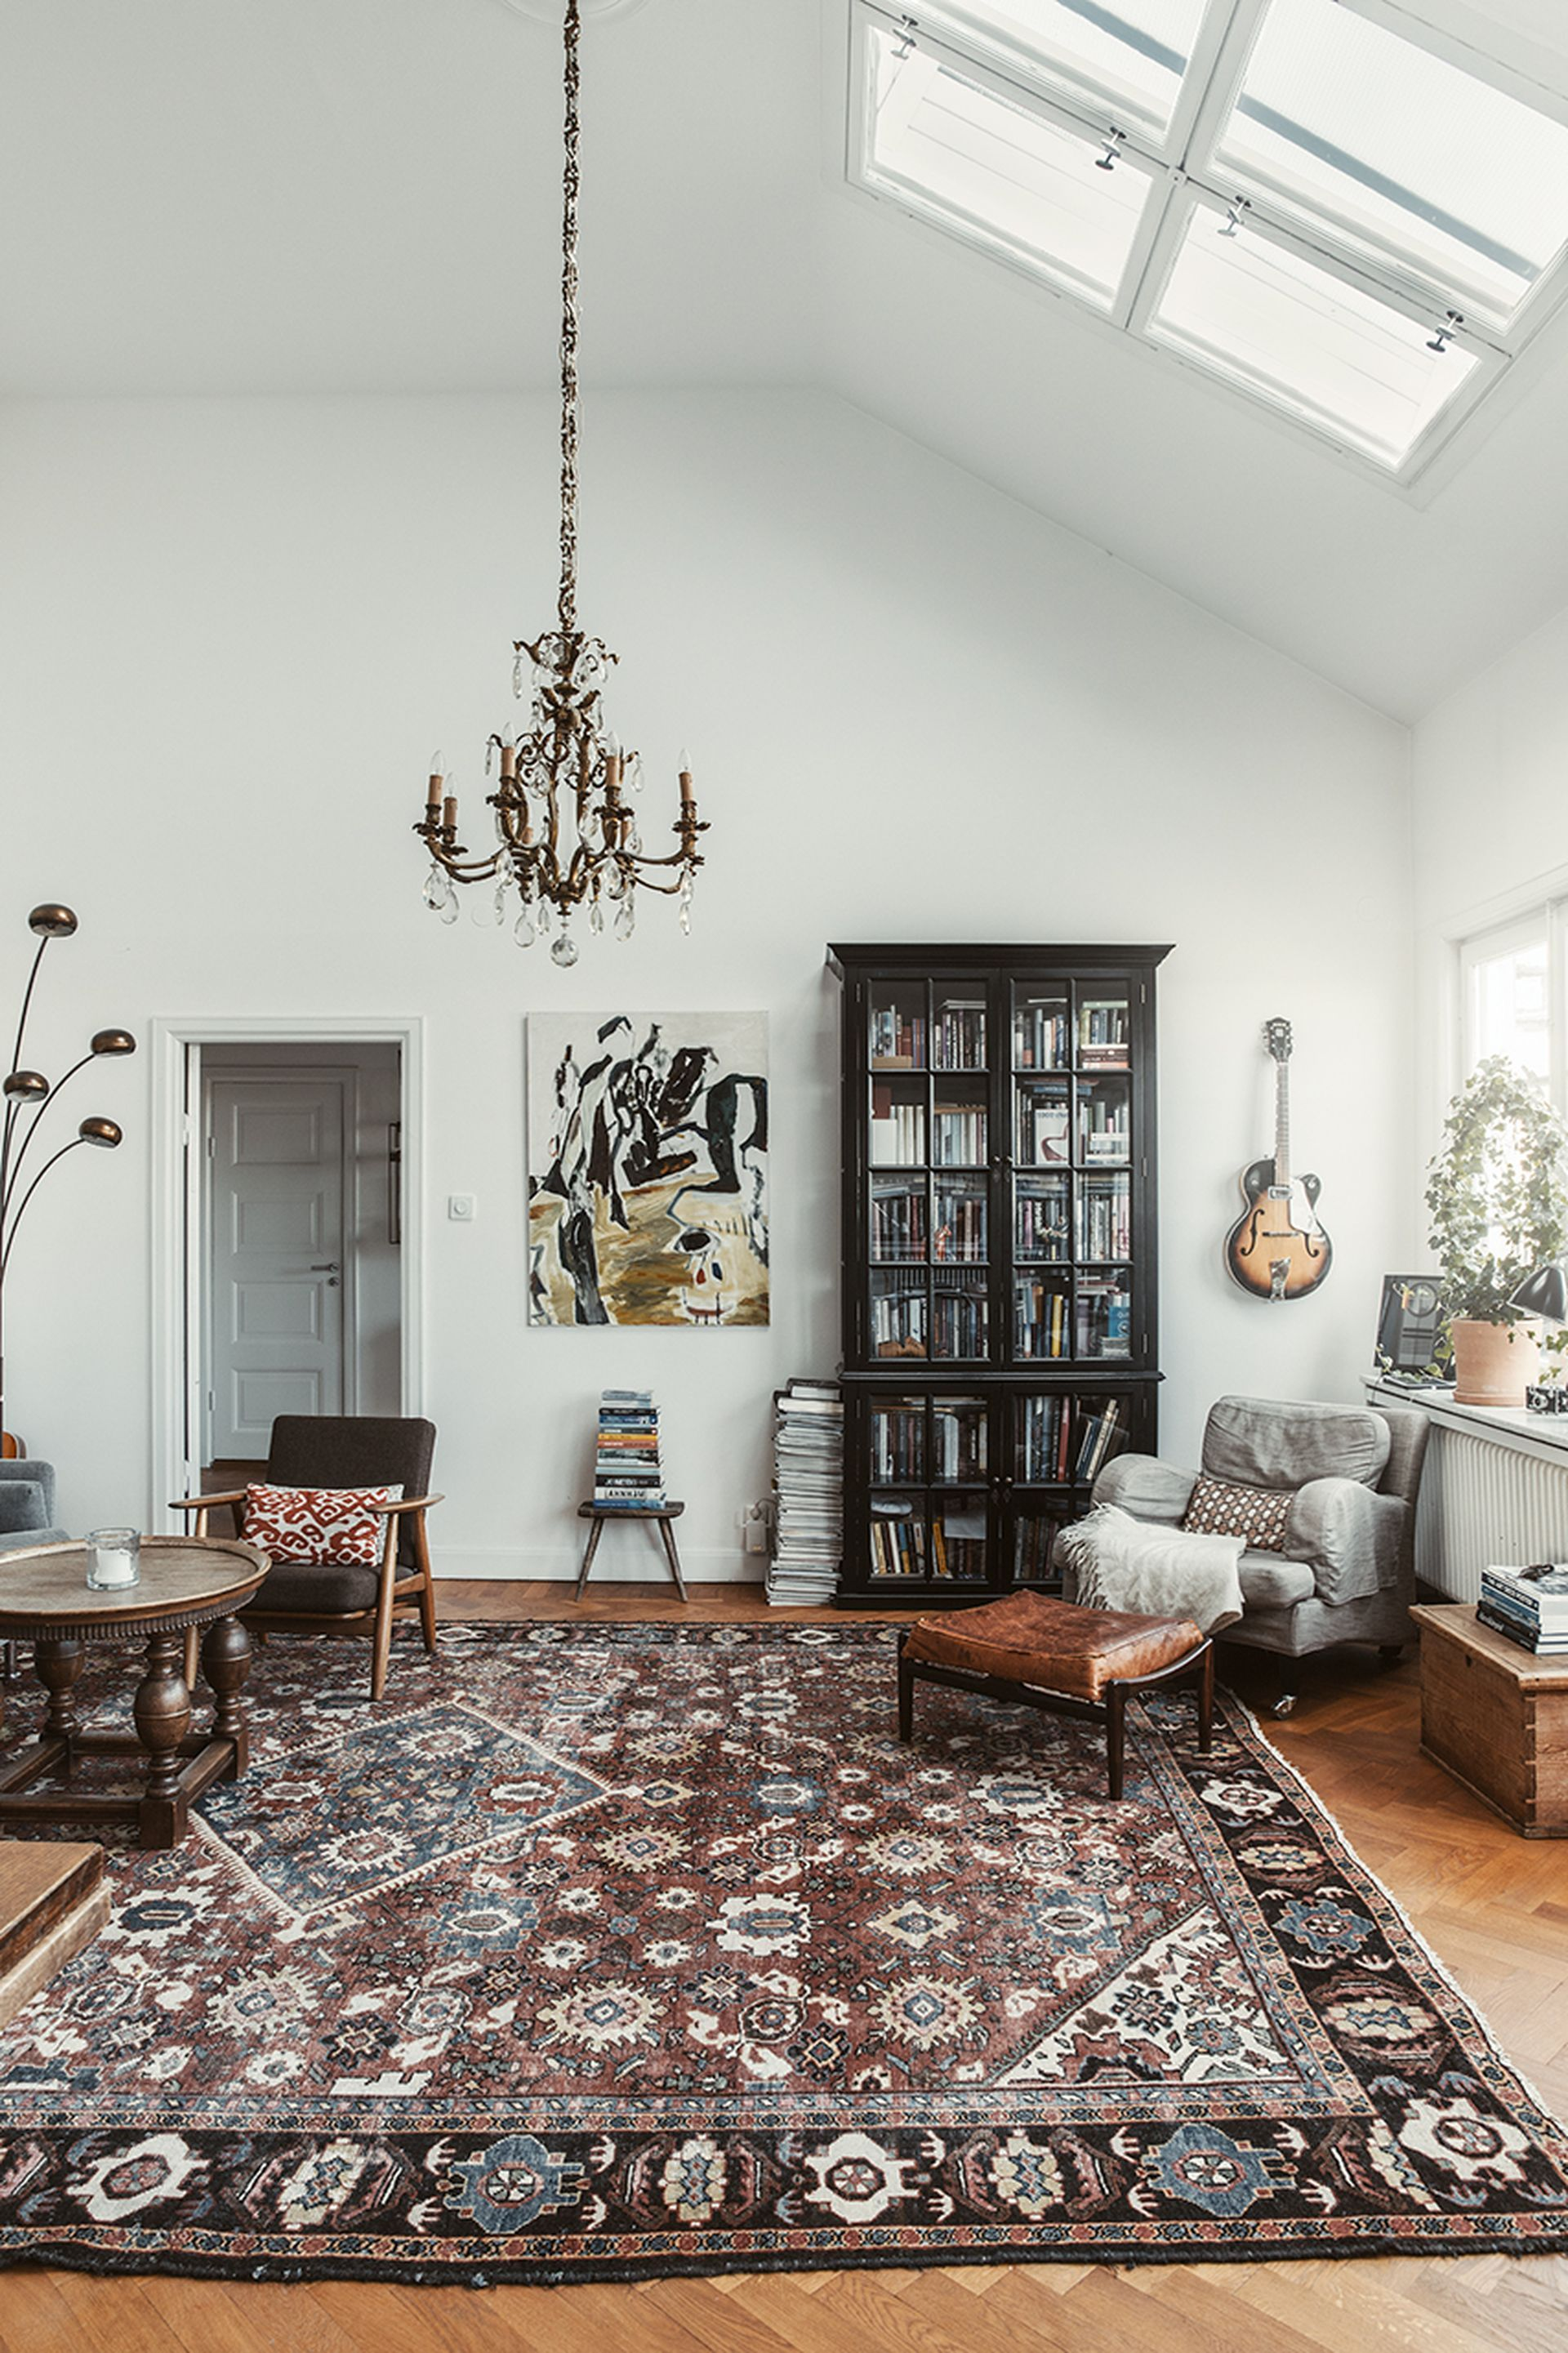 Via alexanderwhite sweet home make sweethomemake interior decoration ideas living also rh in pinterest